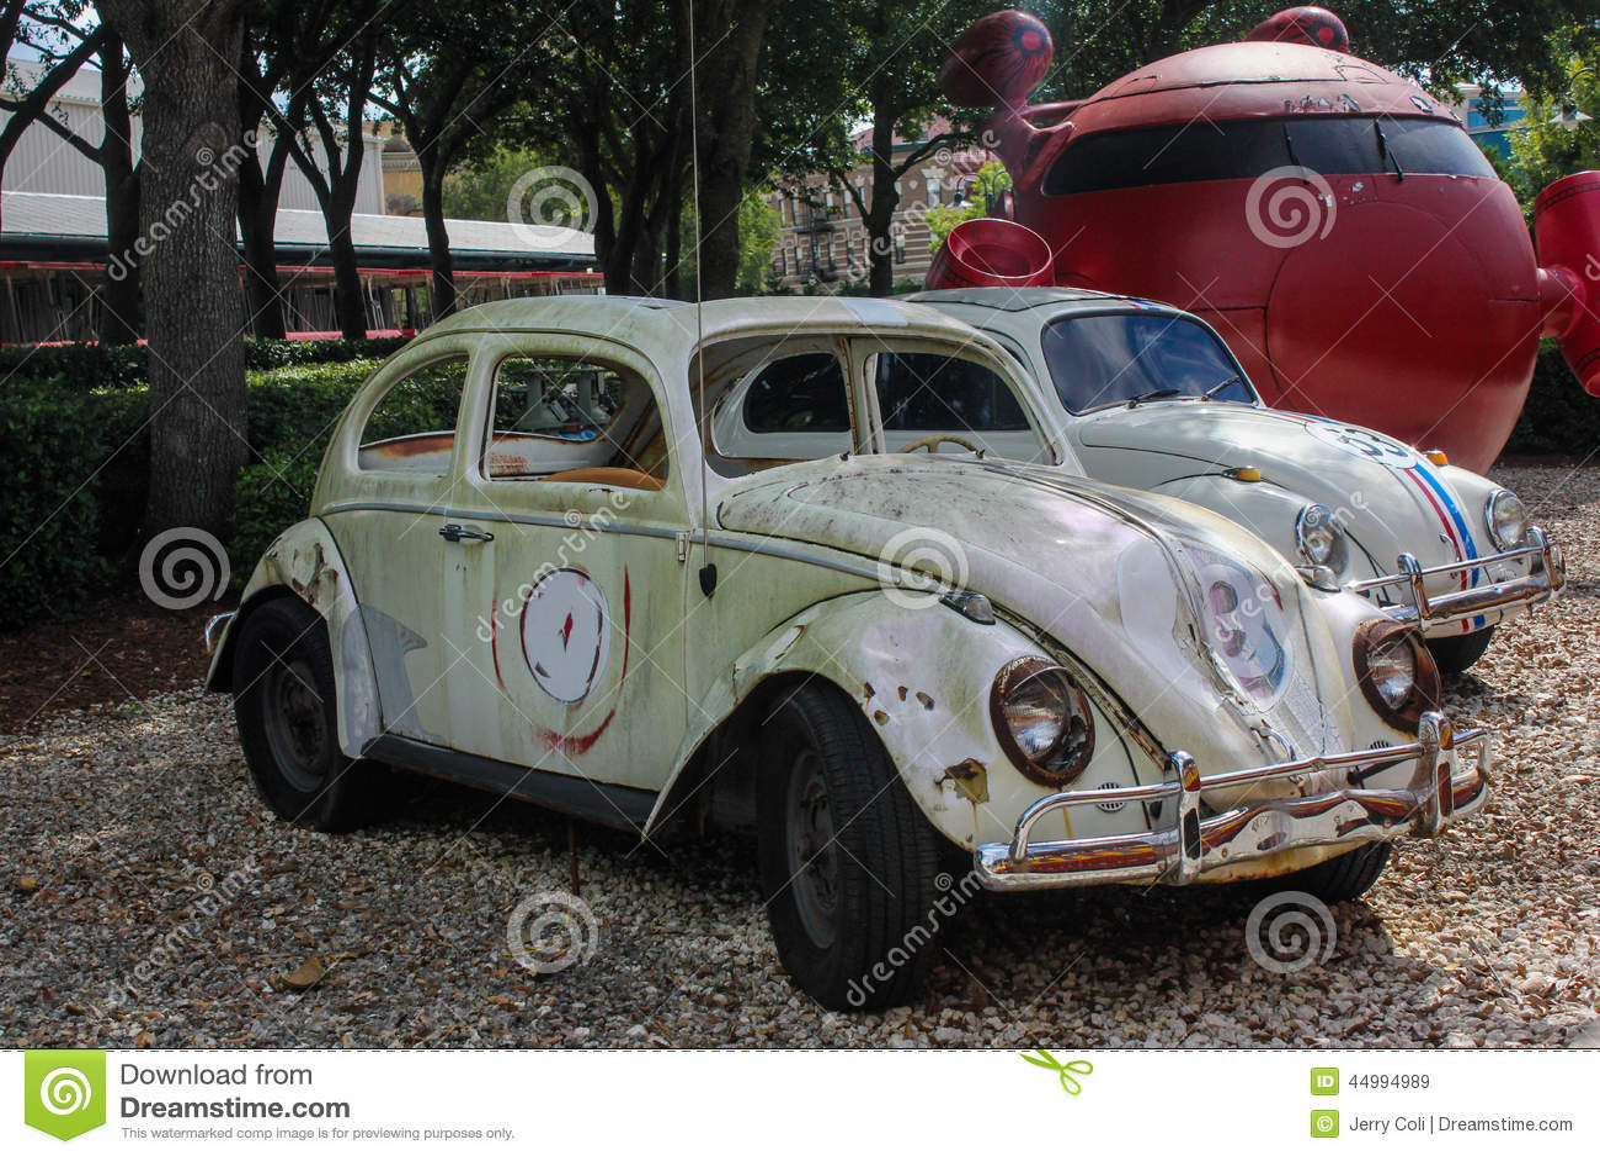 Volkswagen Orlando Autos Post